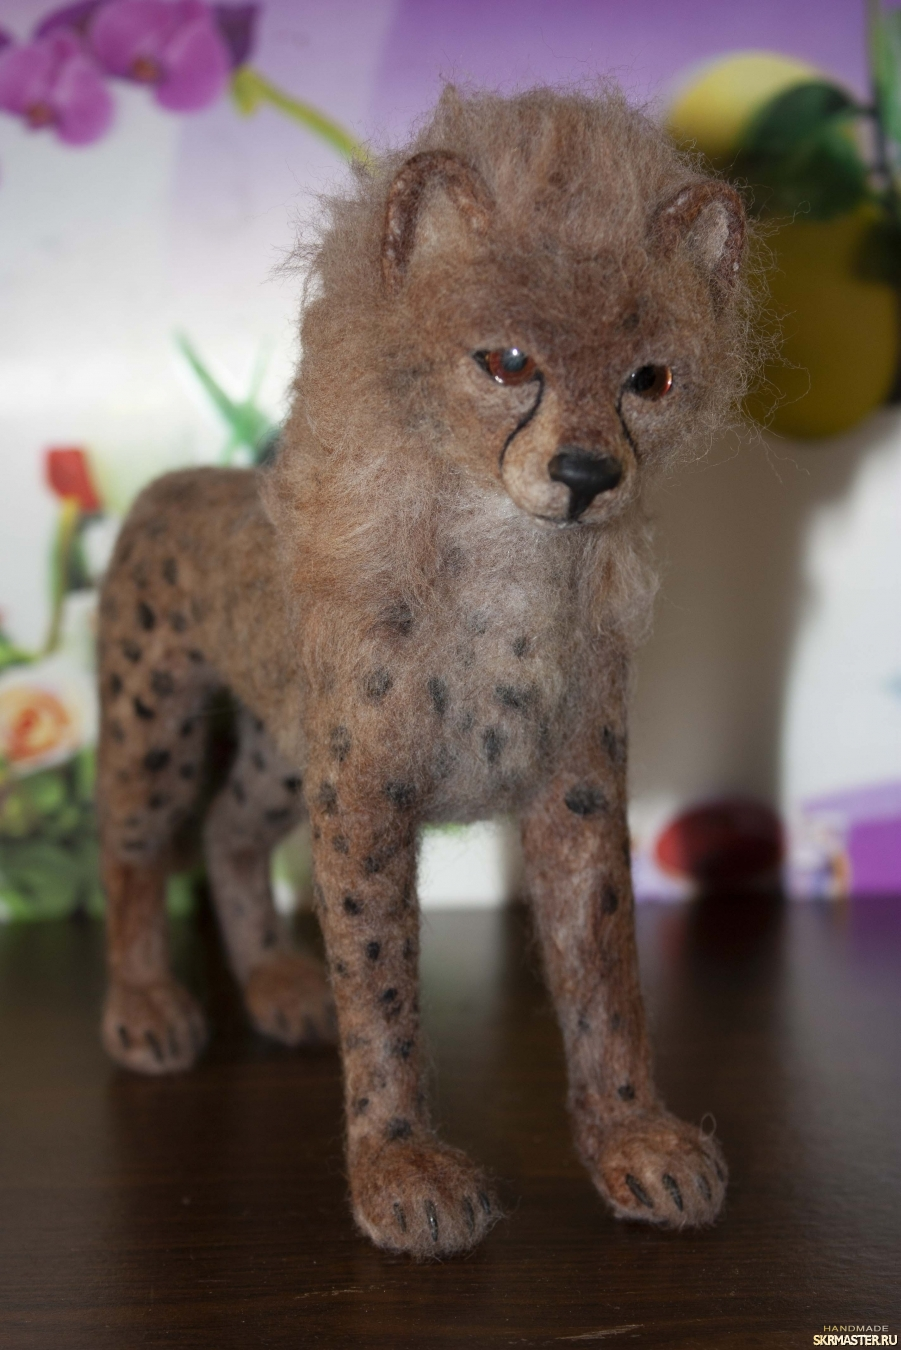 тут изображено гепард котёнок